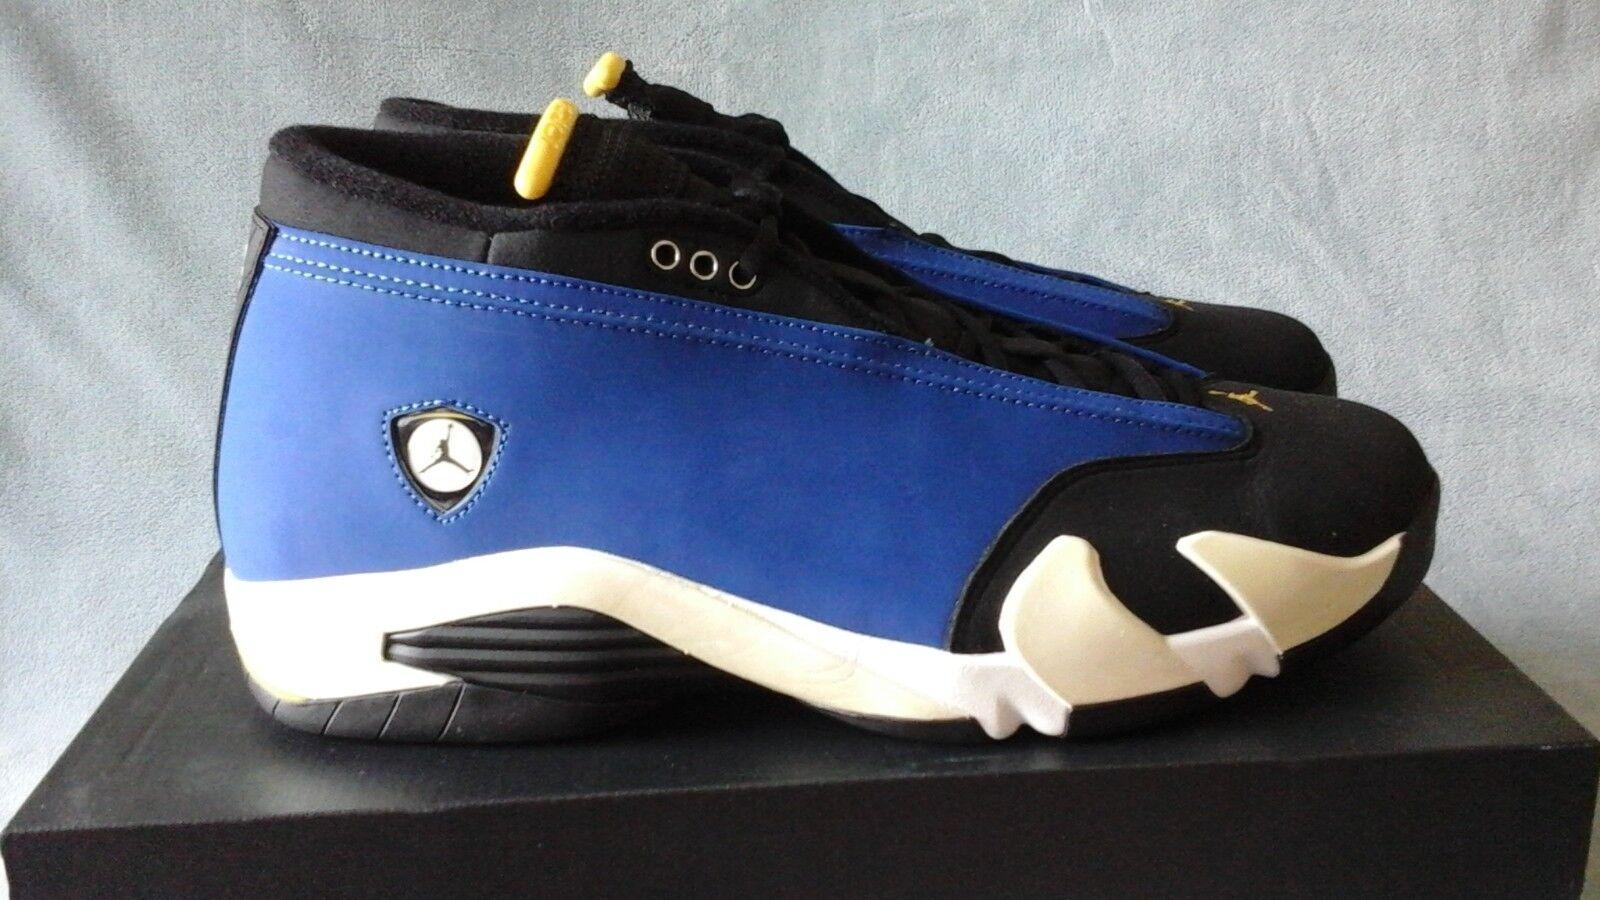 Nike Air Jordan 14 Retro Low Laney Varsity Royal 807511-405 Size 10.5